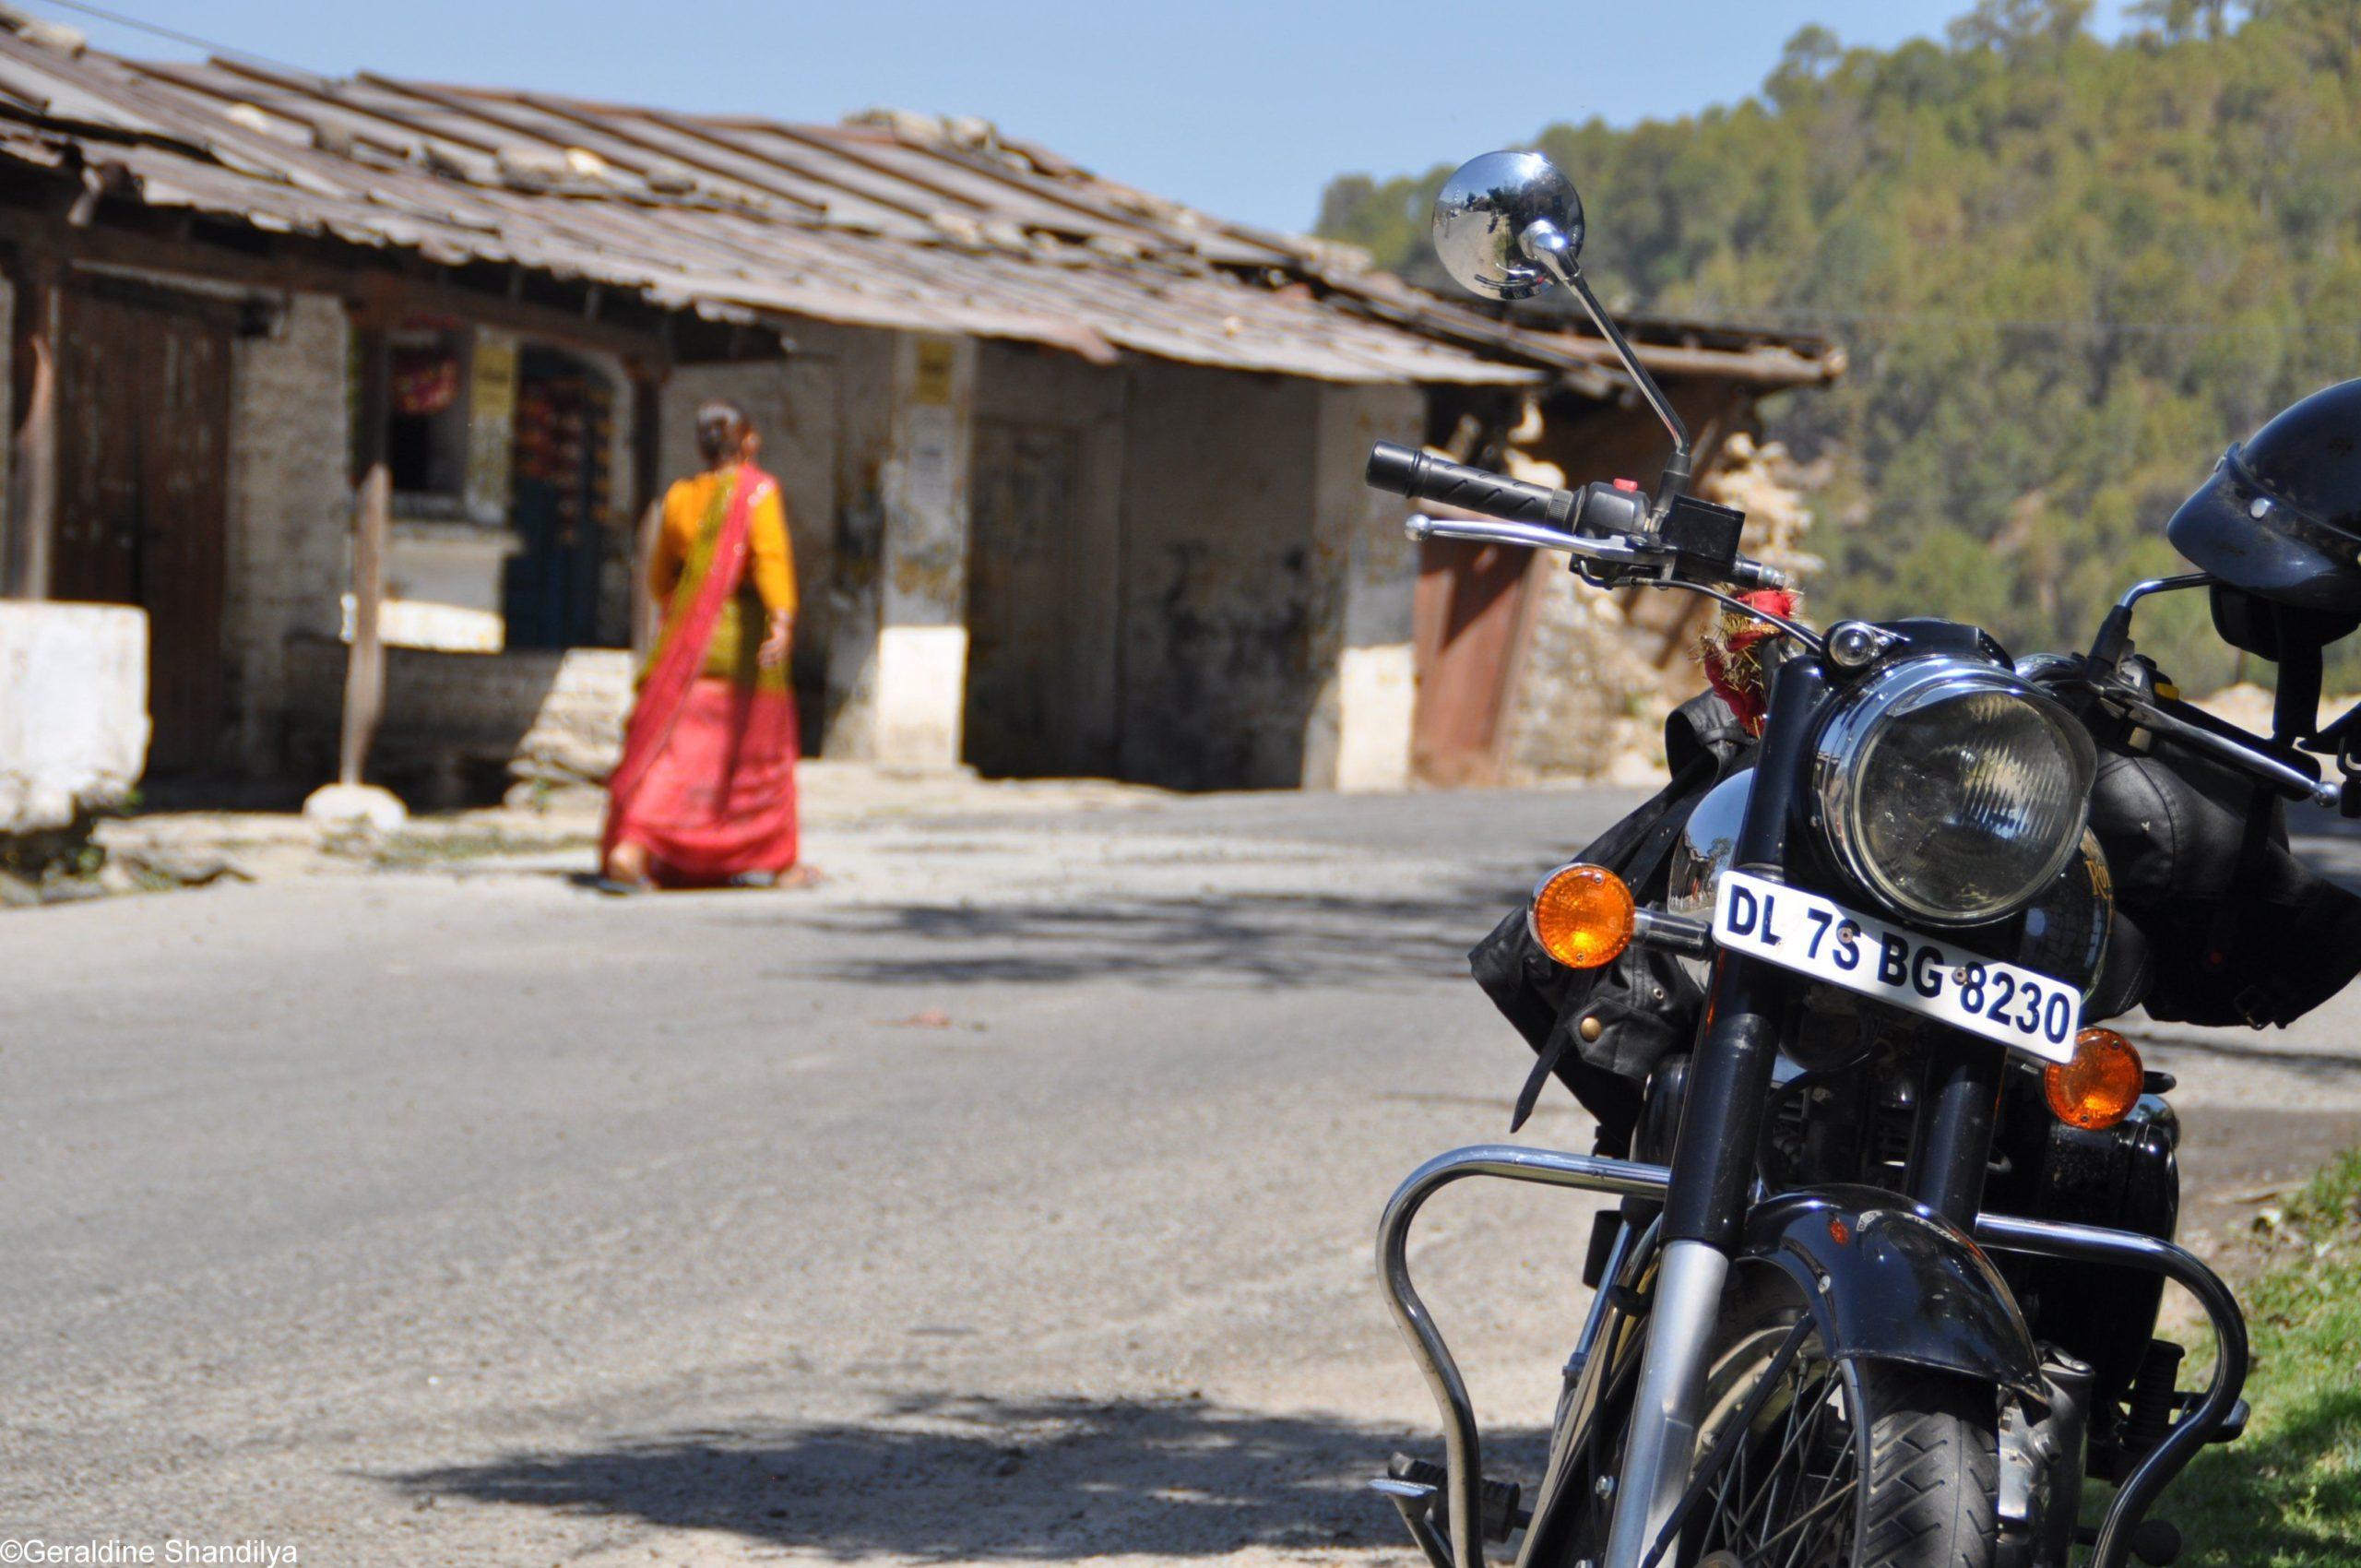 Motorcycle road trip India / Himalaya - Between Sacred Mountains and Rivers